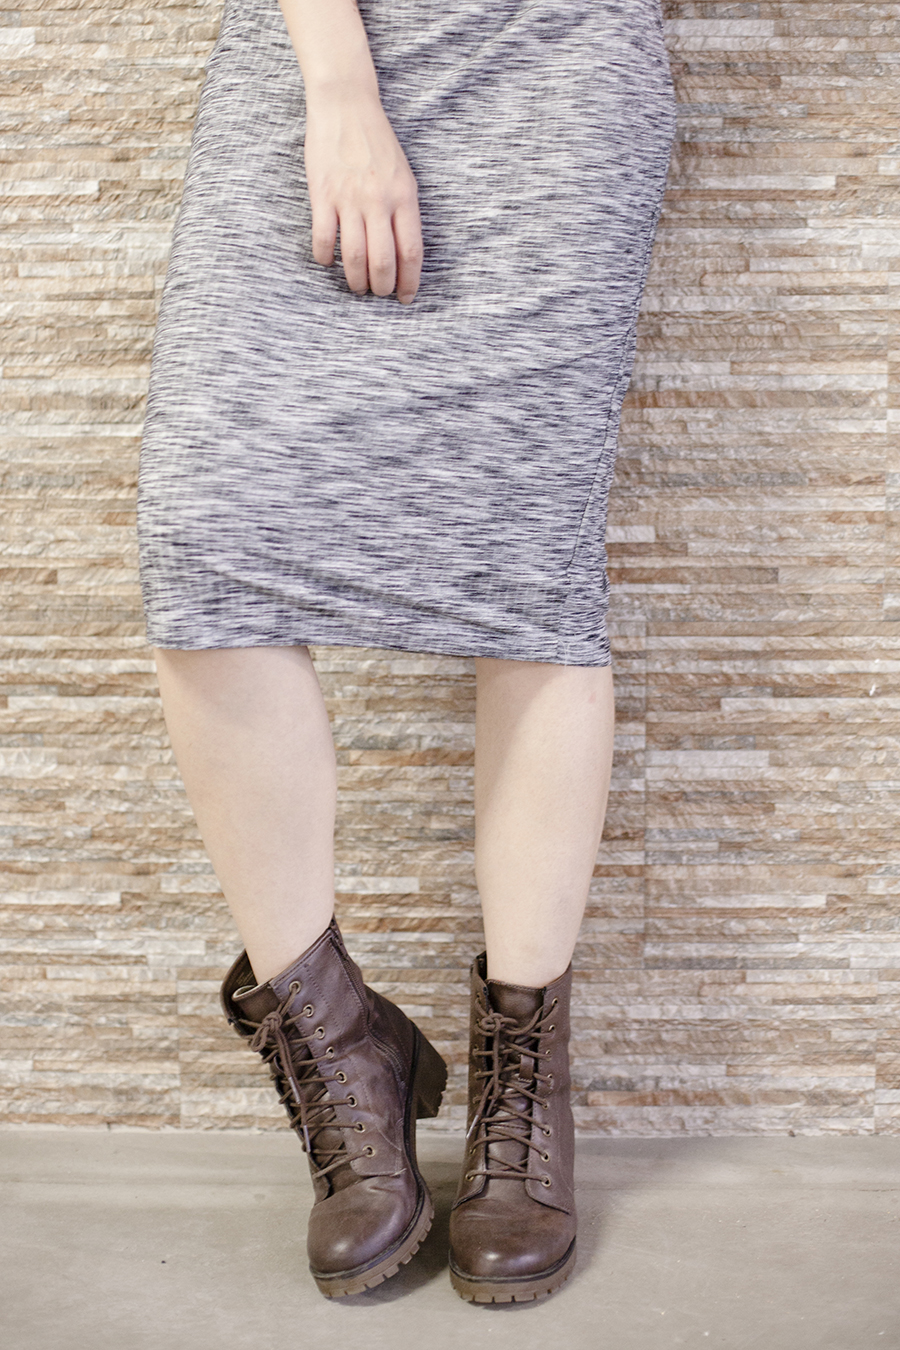 Cotton On heather grey bodycon midi dress, Steve Madden boots.